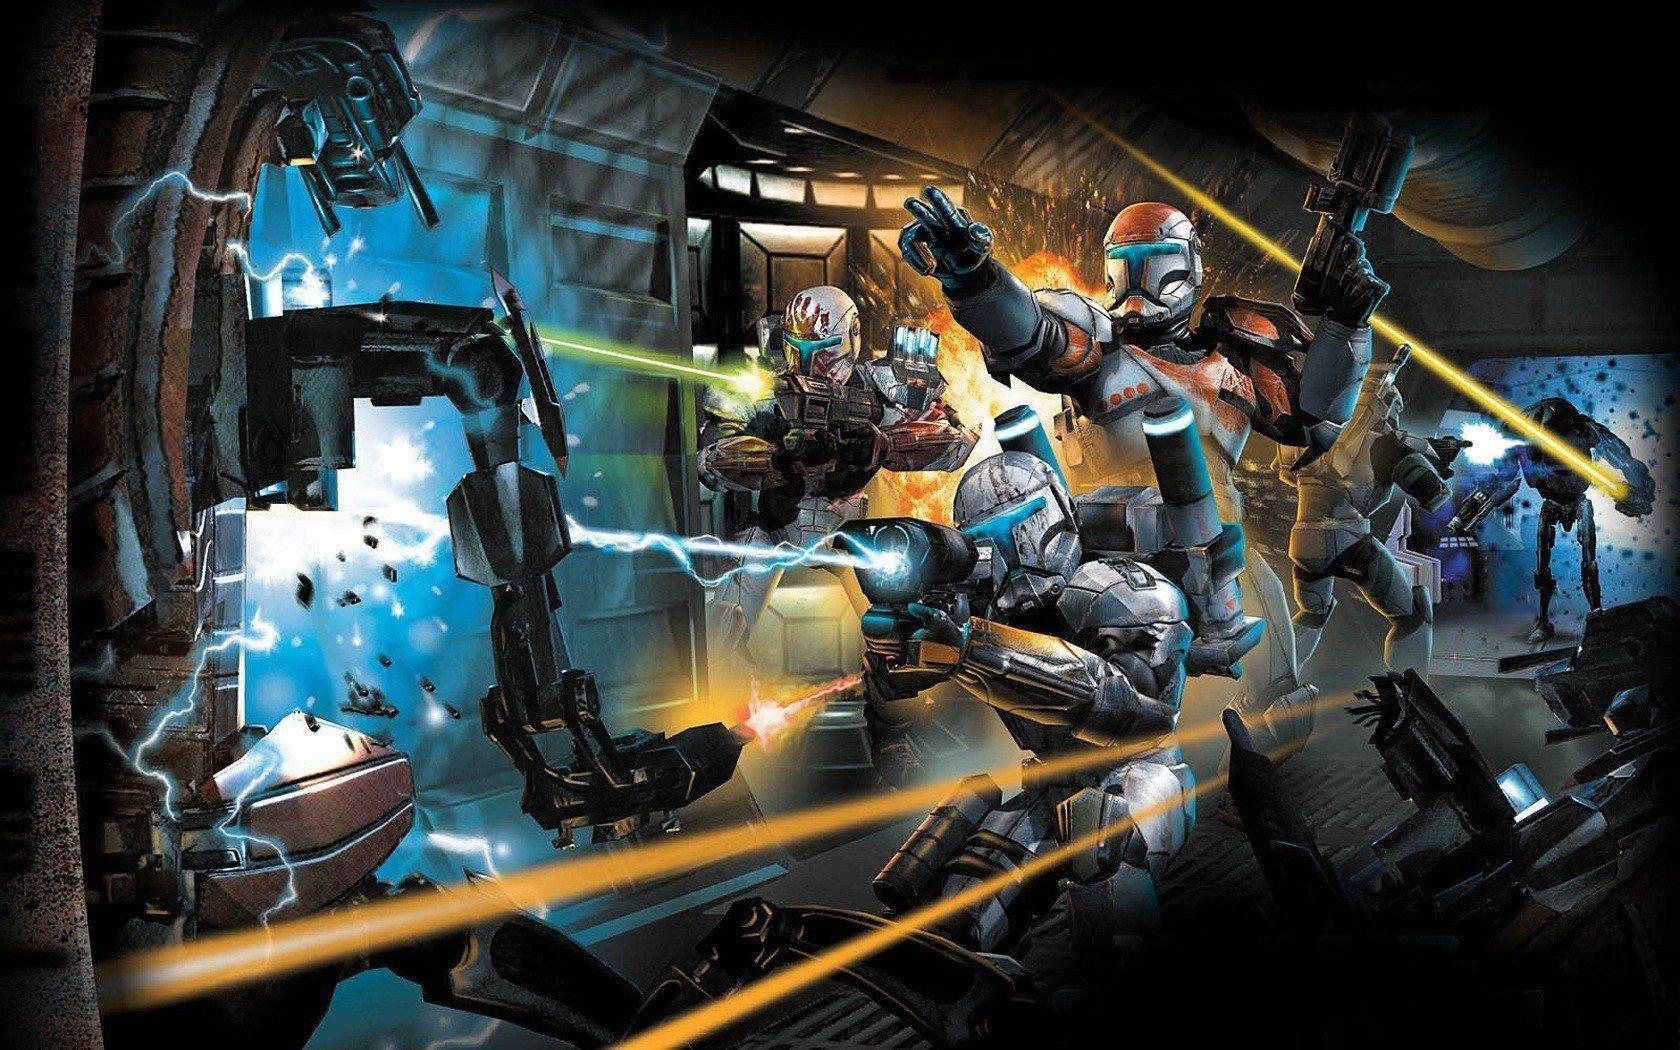 Star Wars Republic Commando Wallpapers Top Free Star Wars Republic Commando Backgrounds Wallpaperaccess